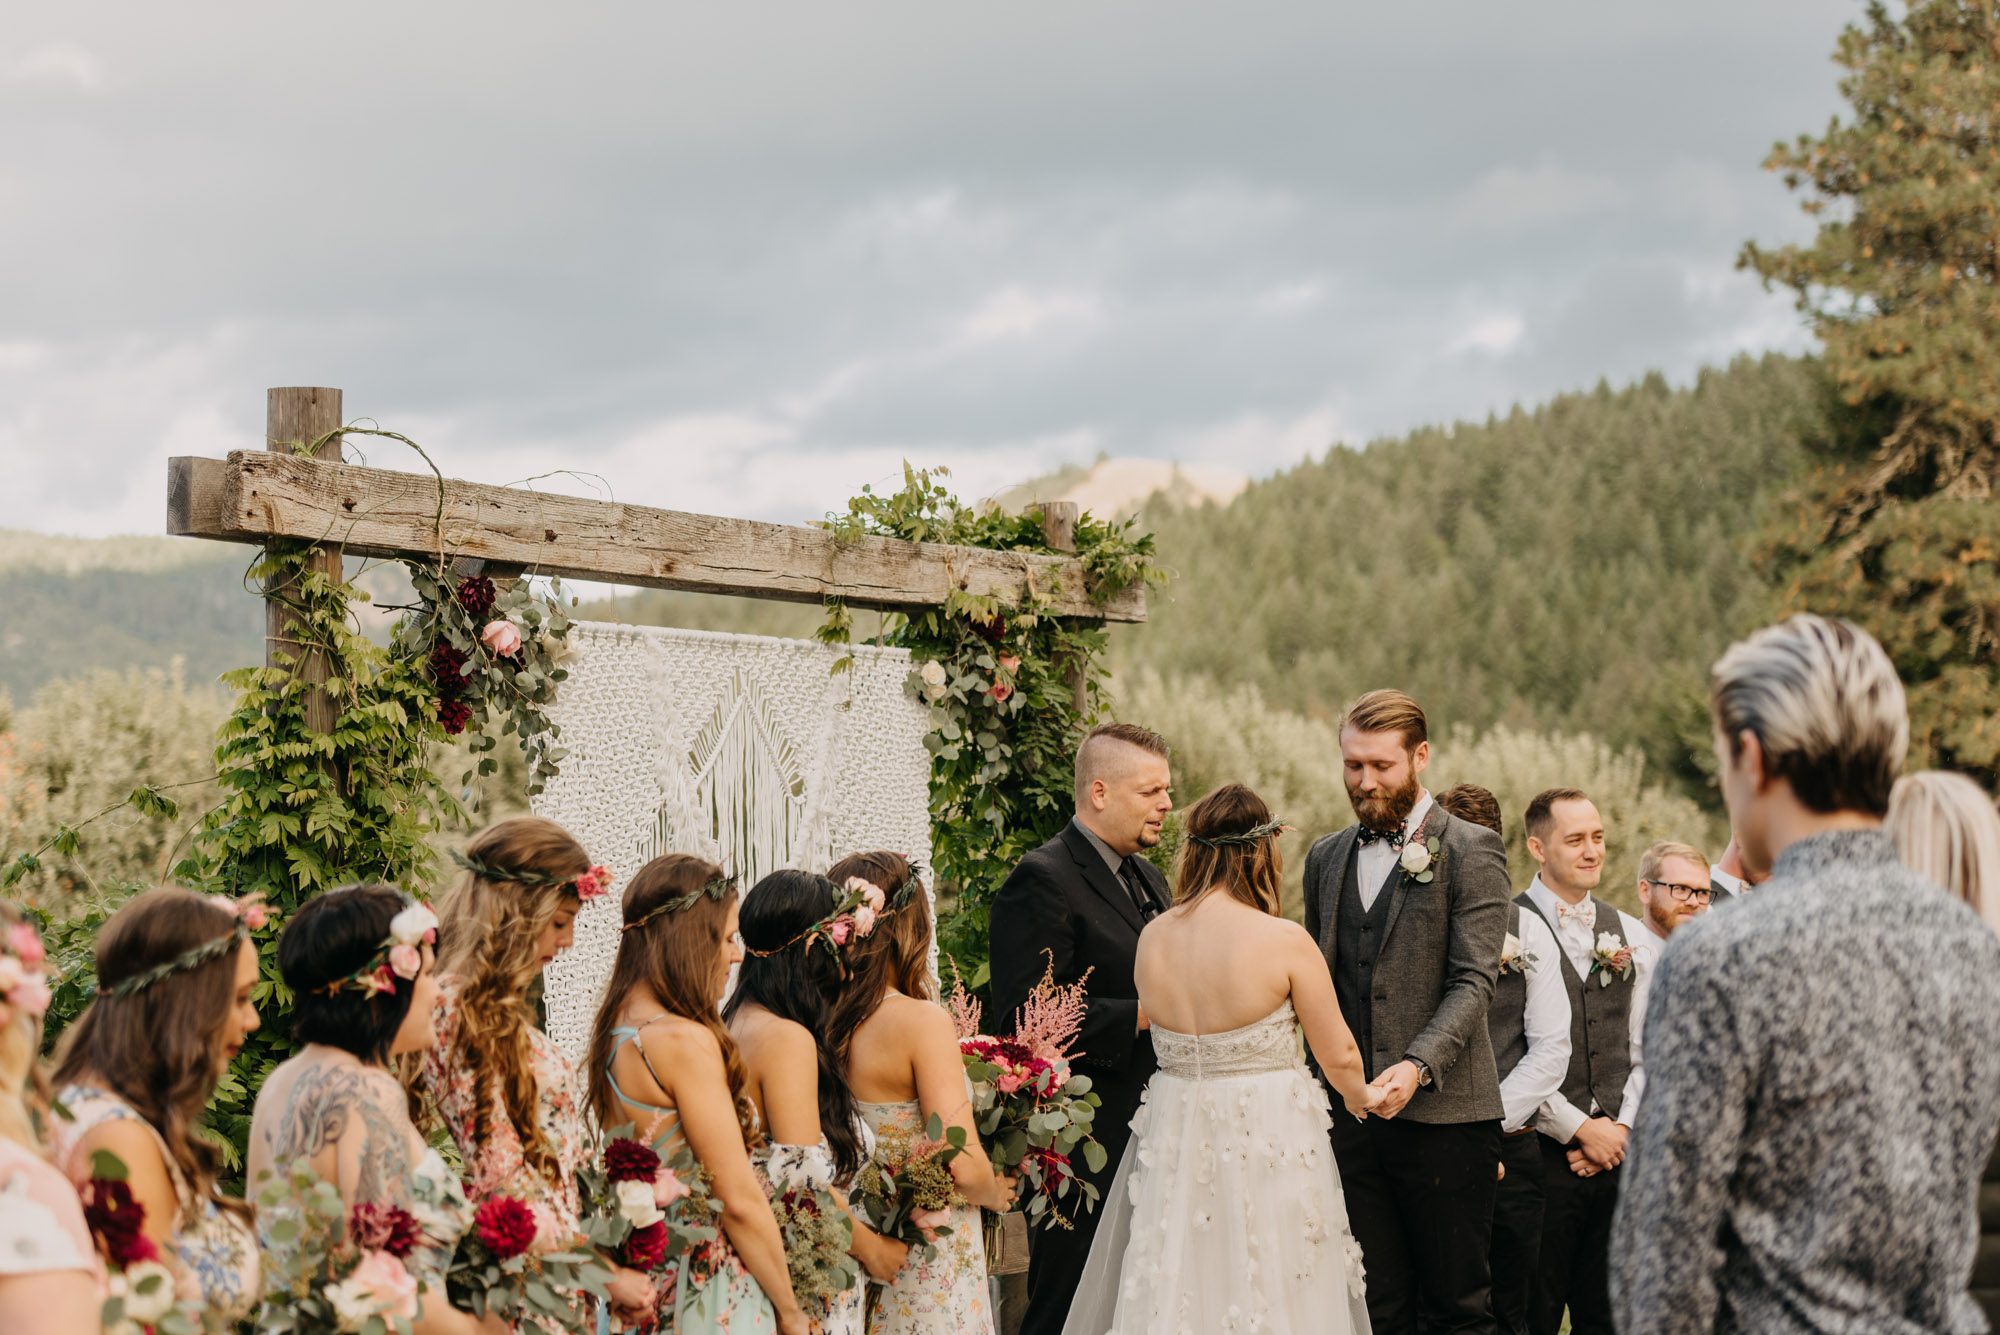 Outdoor-Summer-Ceremony-Washington-Wedding-Rainbow-8948.jpg